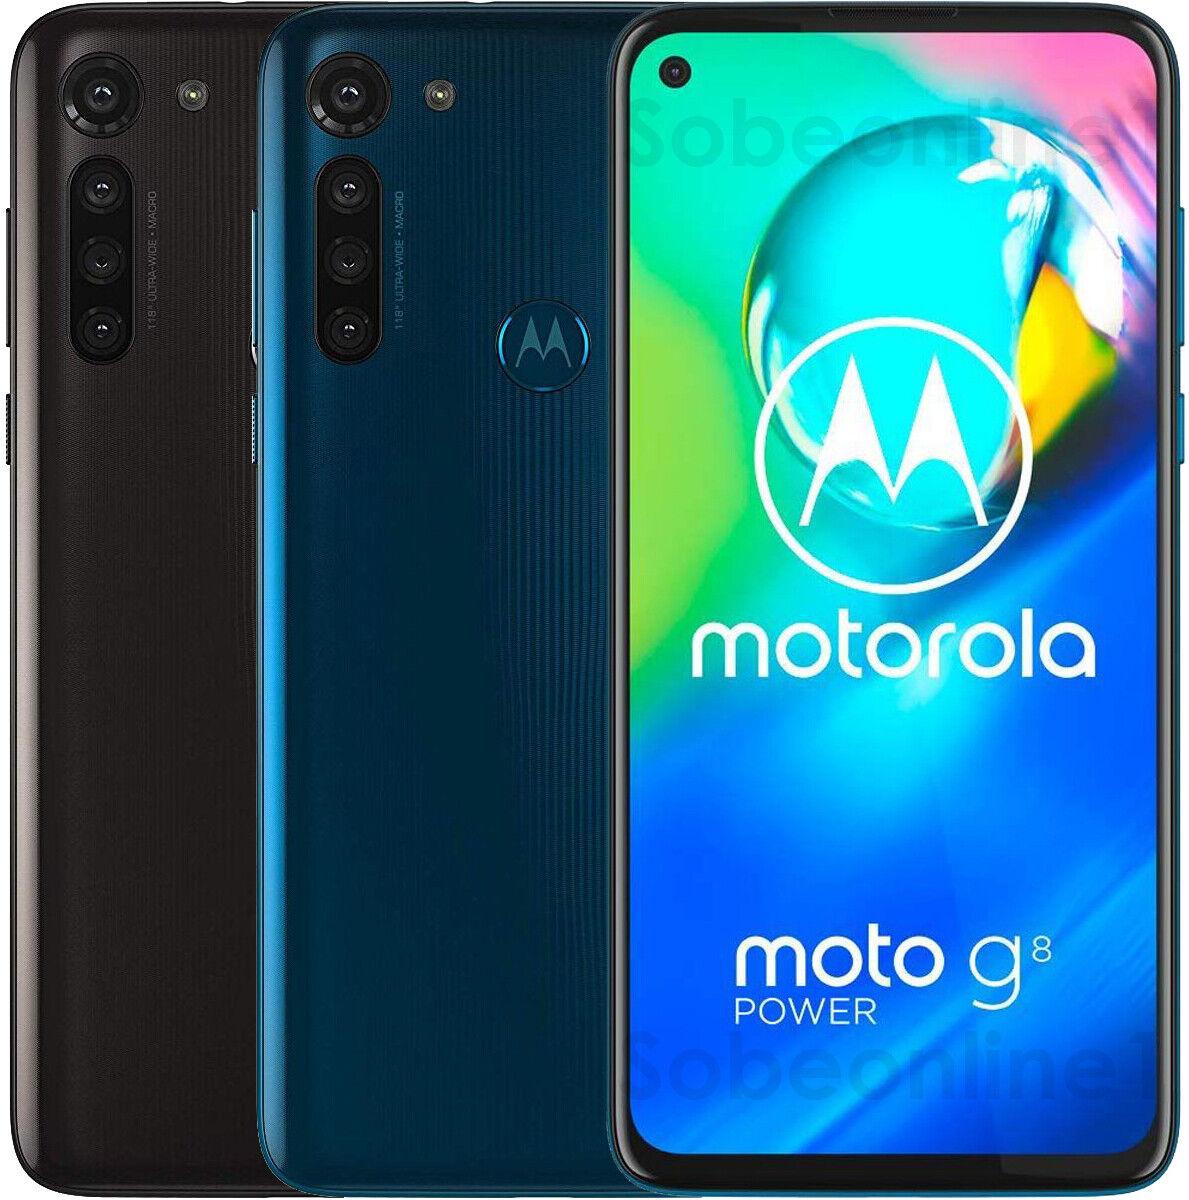 "Motorola Moto G8 Power 64GB 4GB RAM XT2041-1 (FACTORY UNLOCKED) 6.4""  Dual Sim"